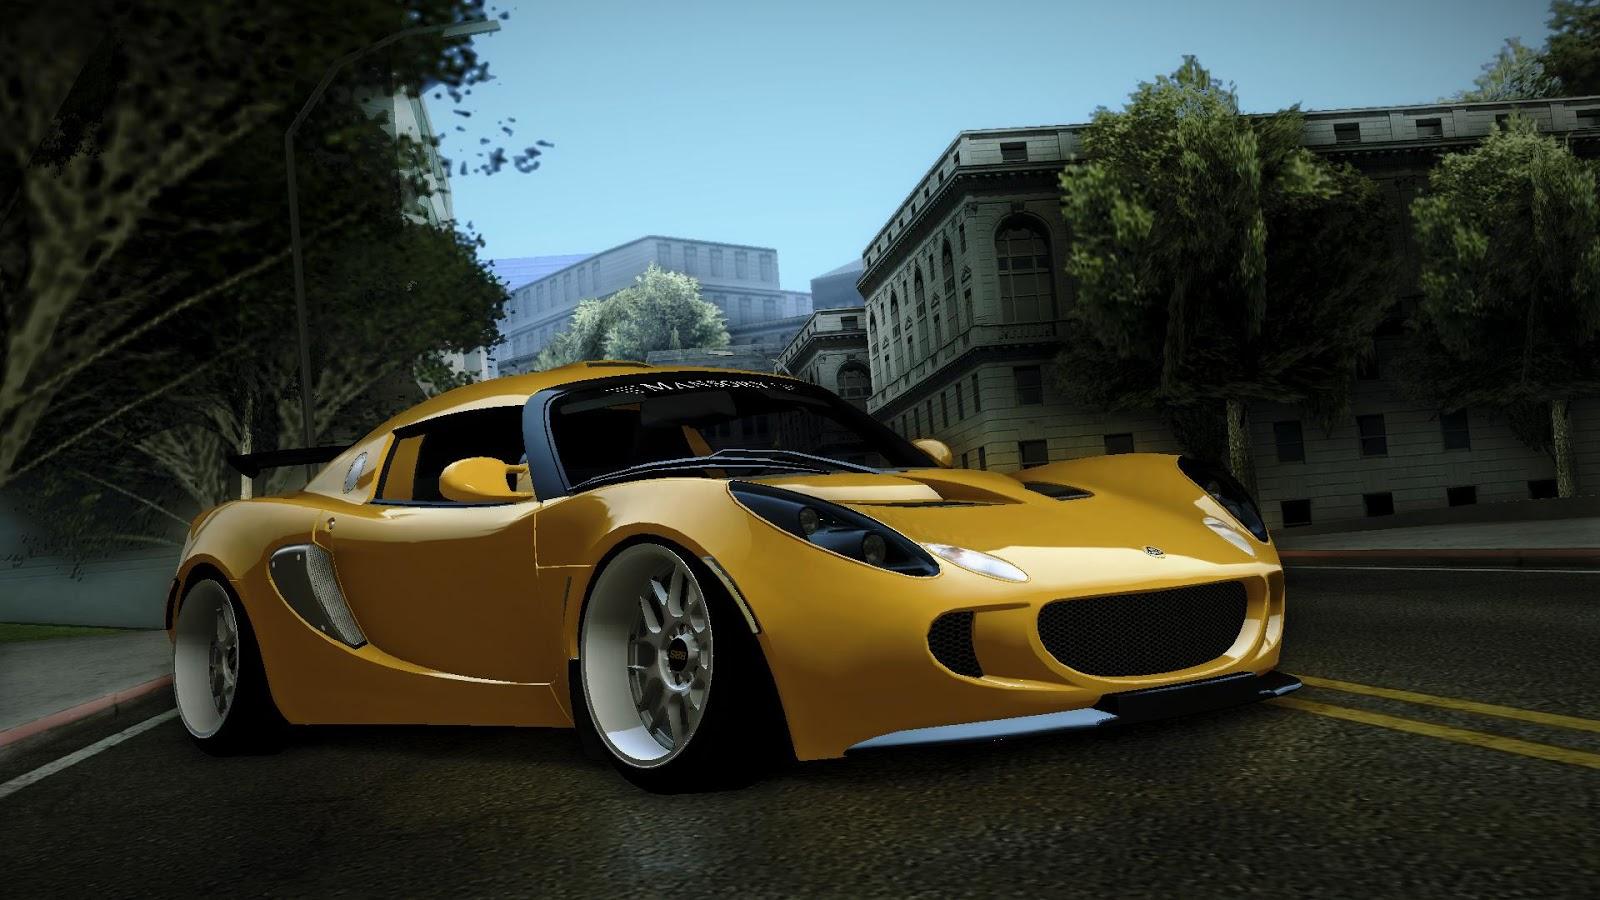 Autos Media: Lotus Exige Track Car